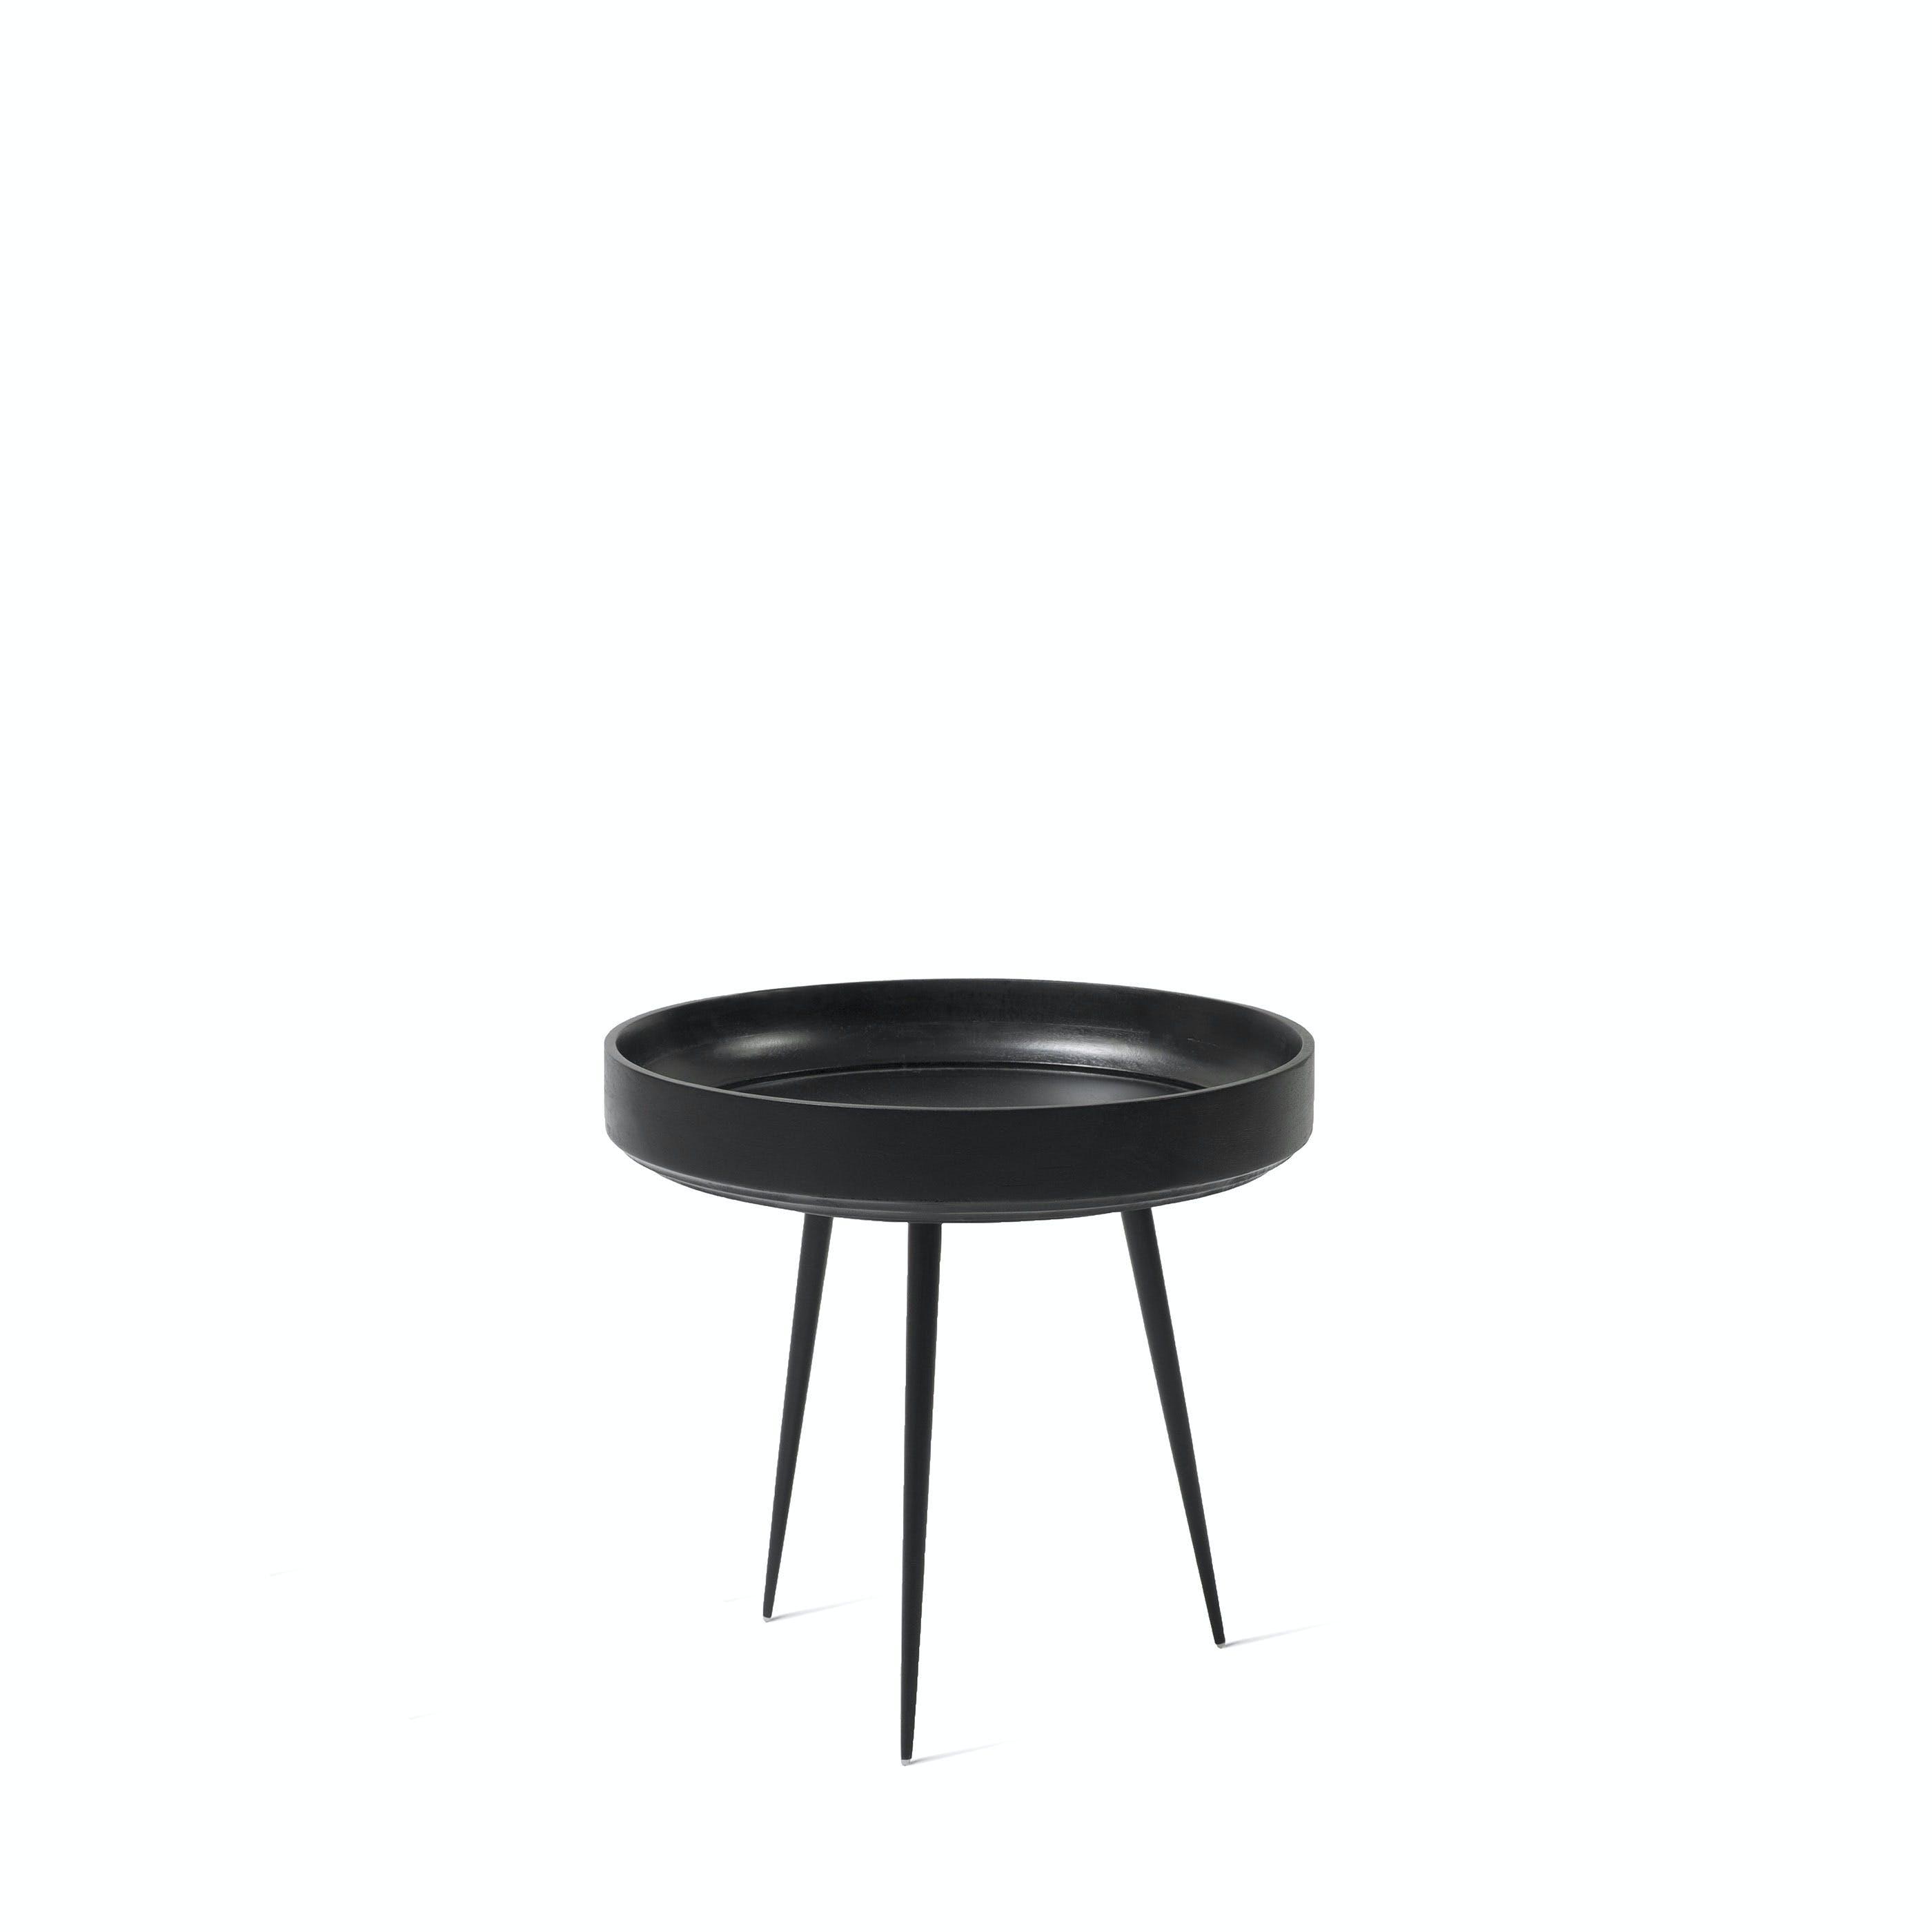 Mater Black Small Bowl Table Haute Living